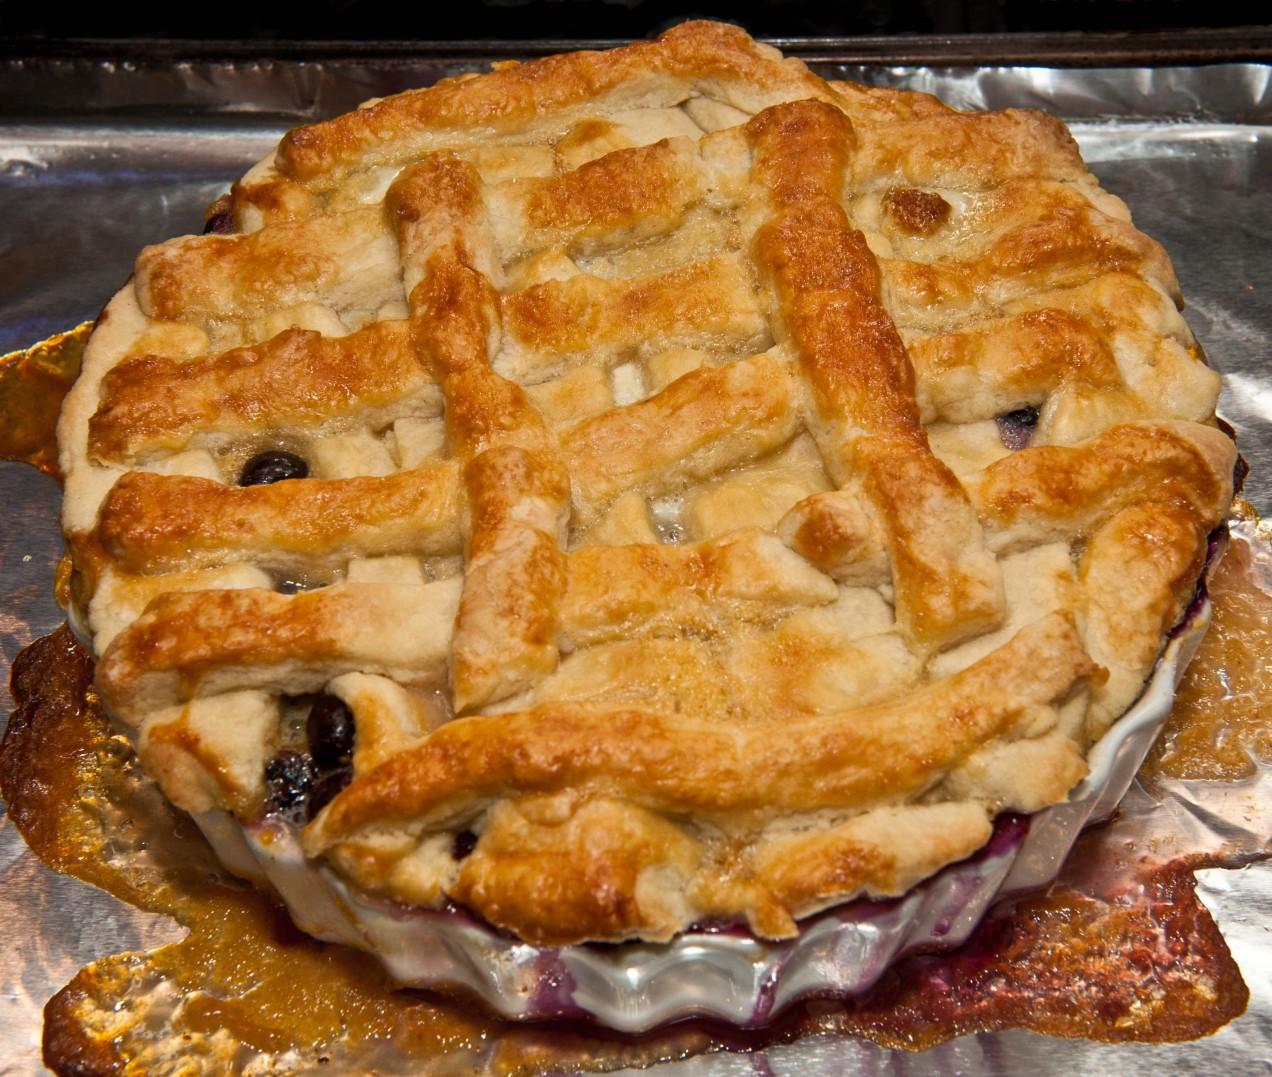 Peach cobbler or pie